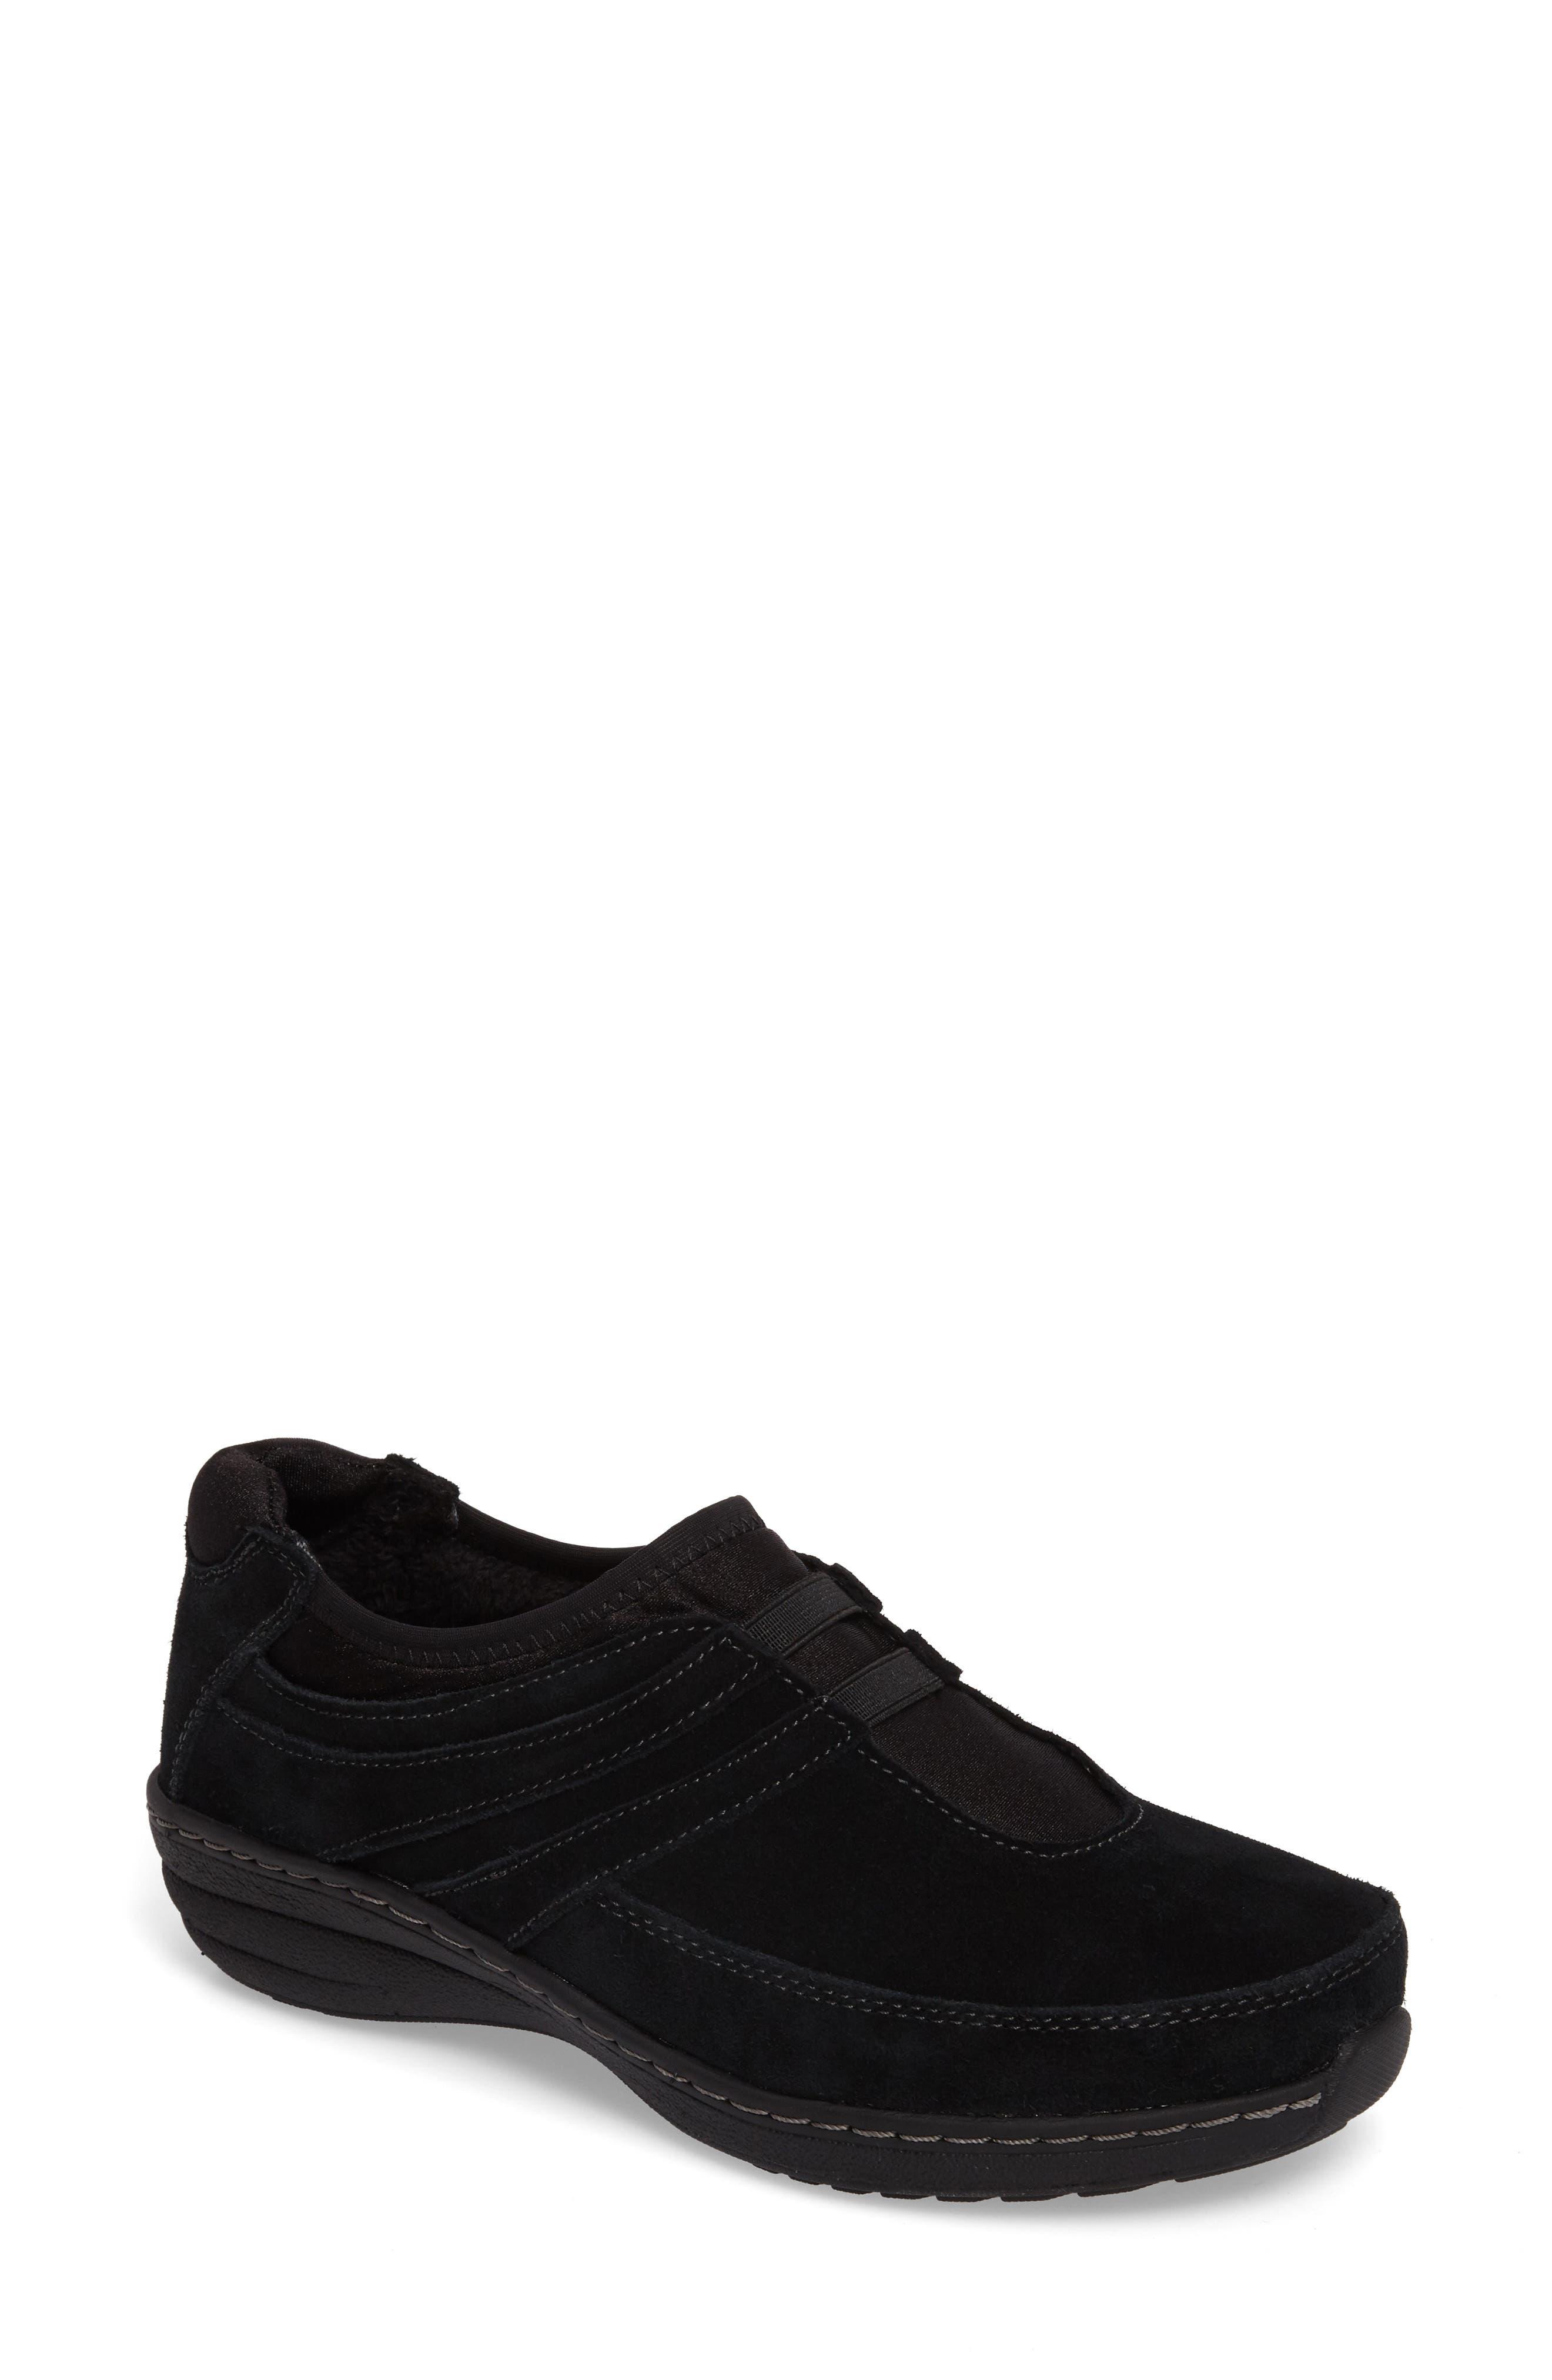 Aetrex Berries Slip-On Sneaker (Women)